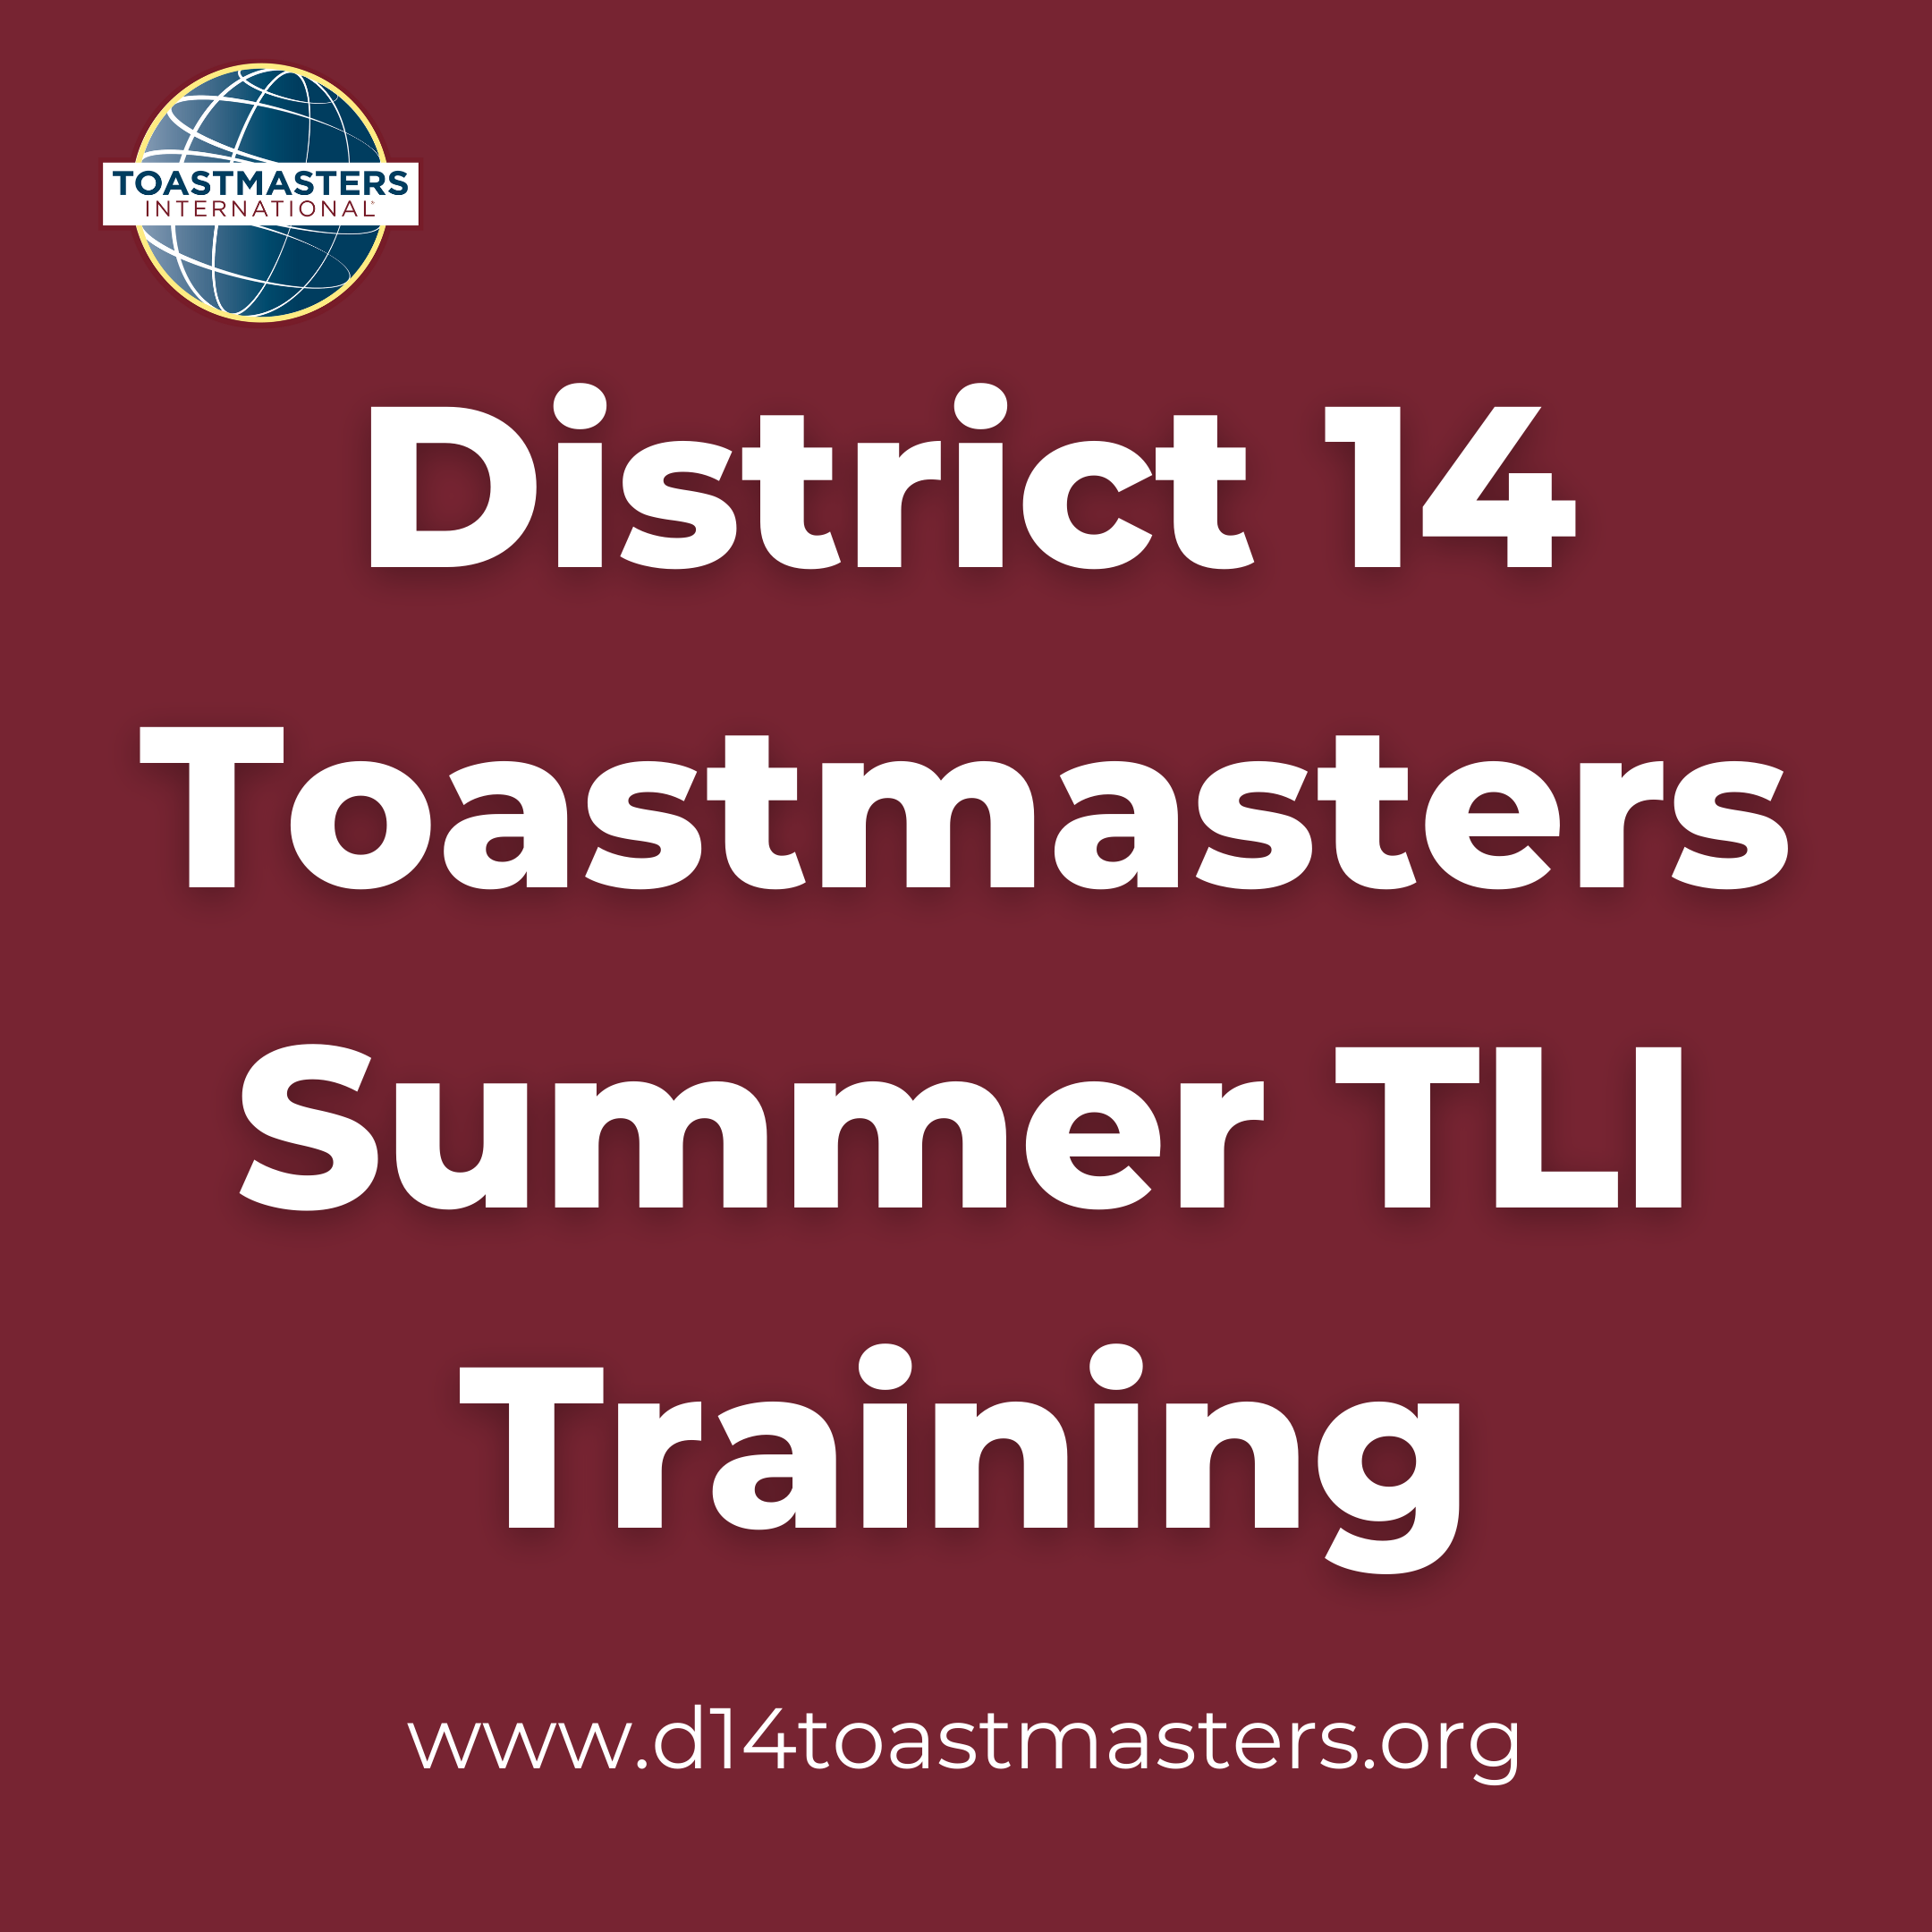 District 14 Toastmasters Summer TLI Training